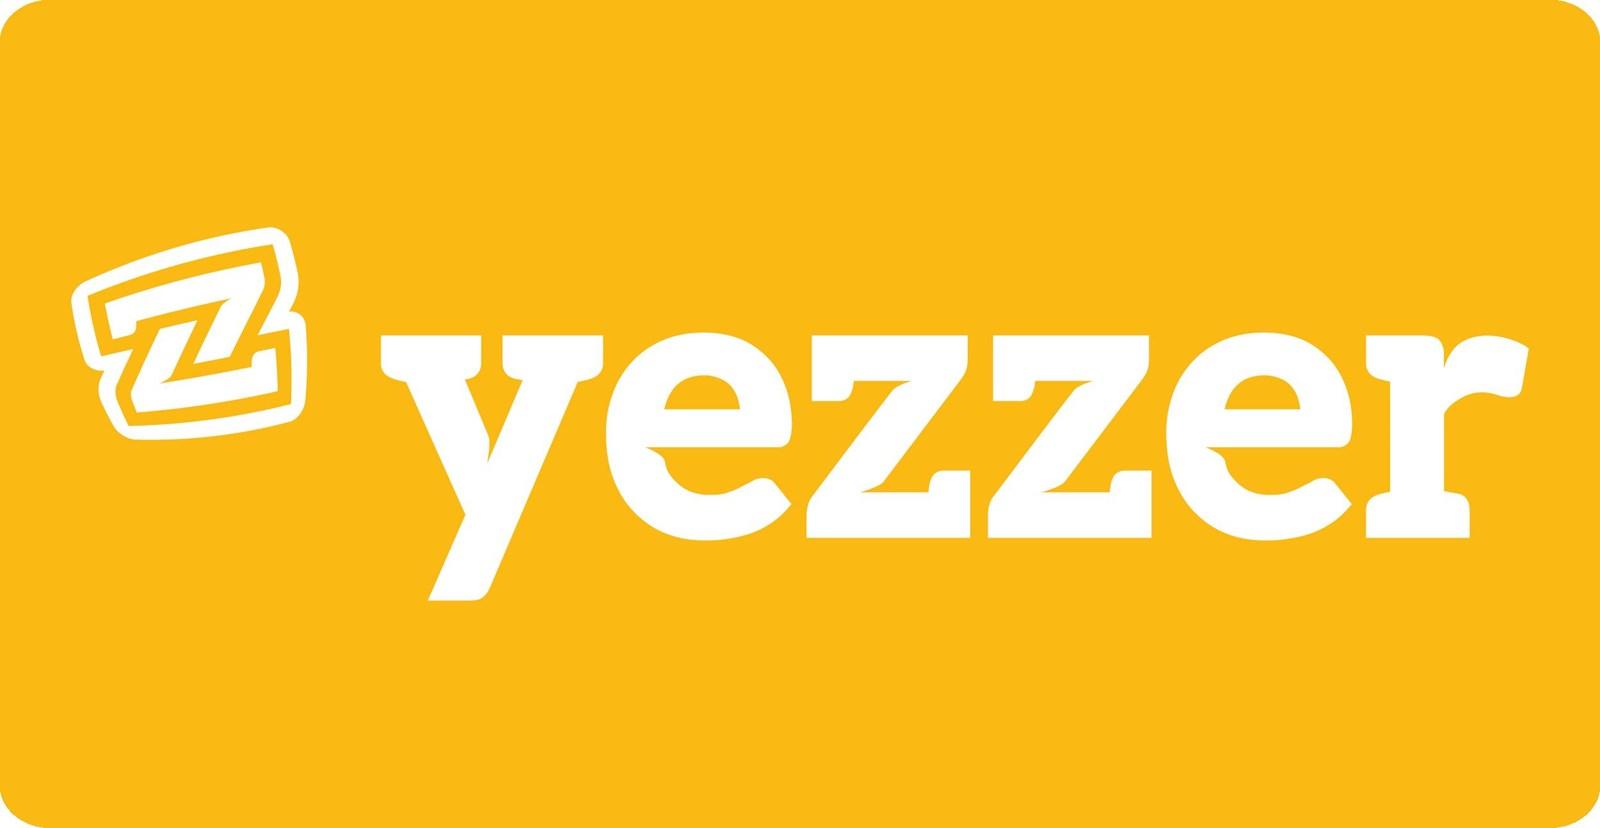 Logo van Yezzer